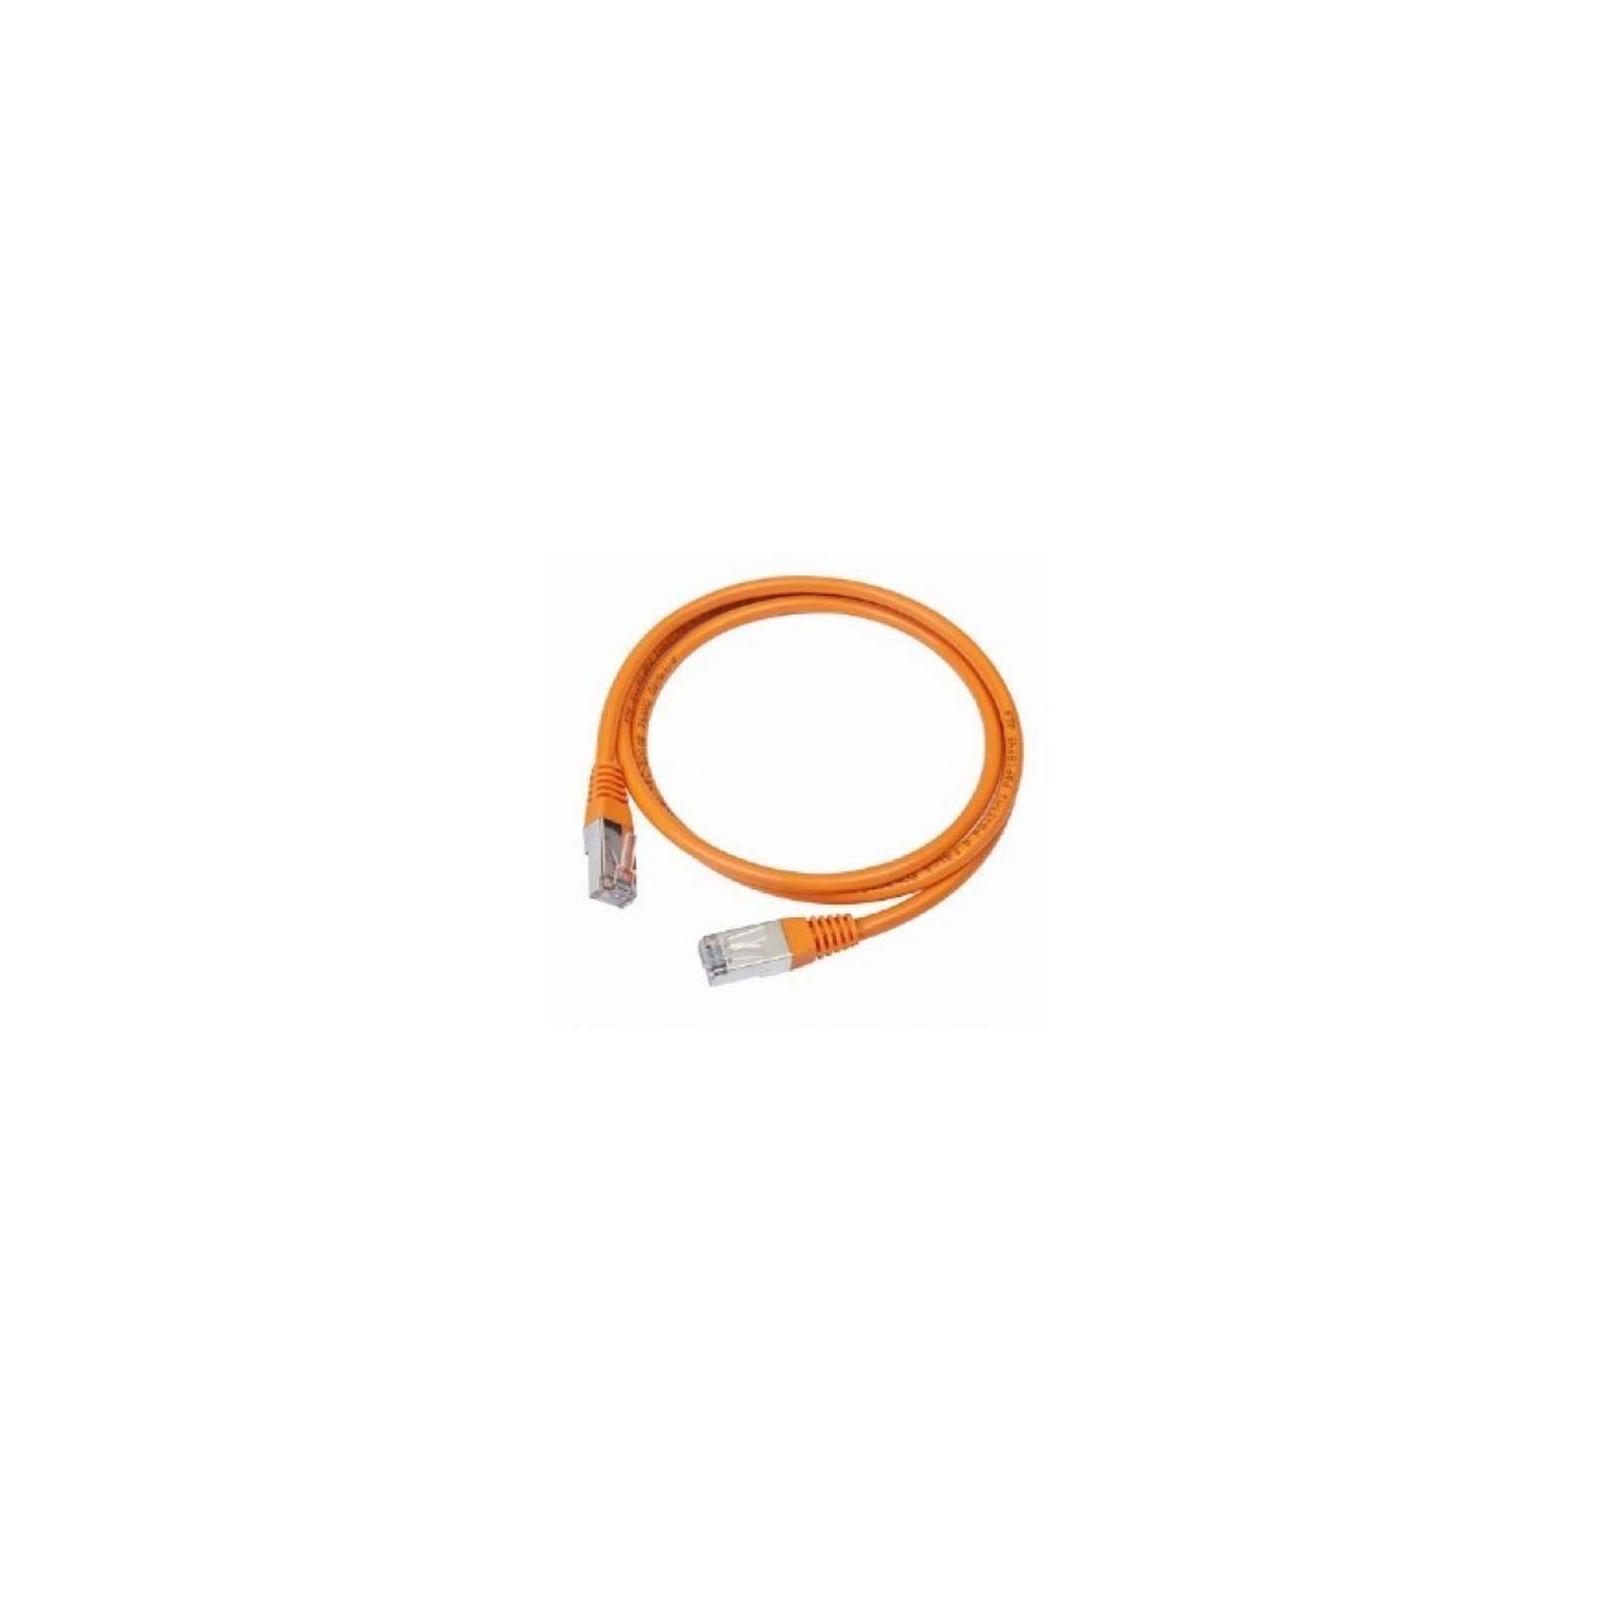 Патч-корд Cablexpert 0.5м (PP12-0.5M/O)